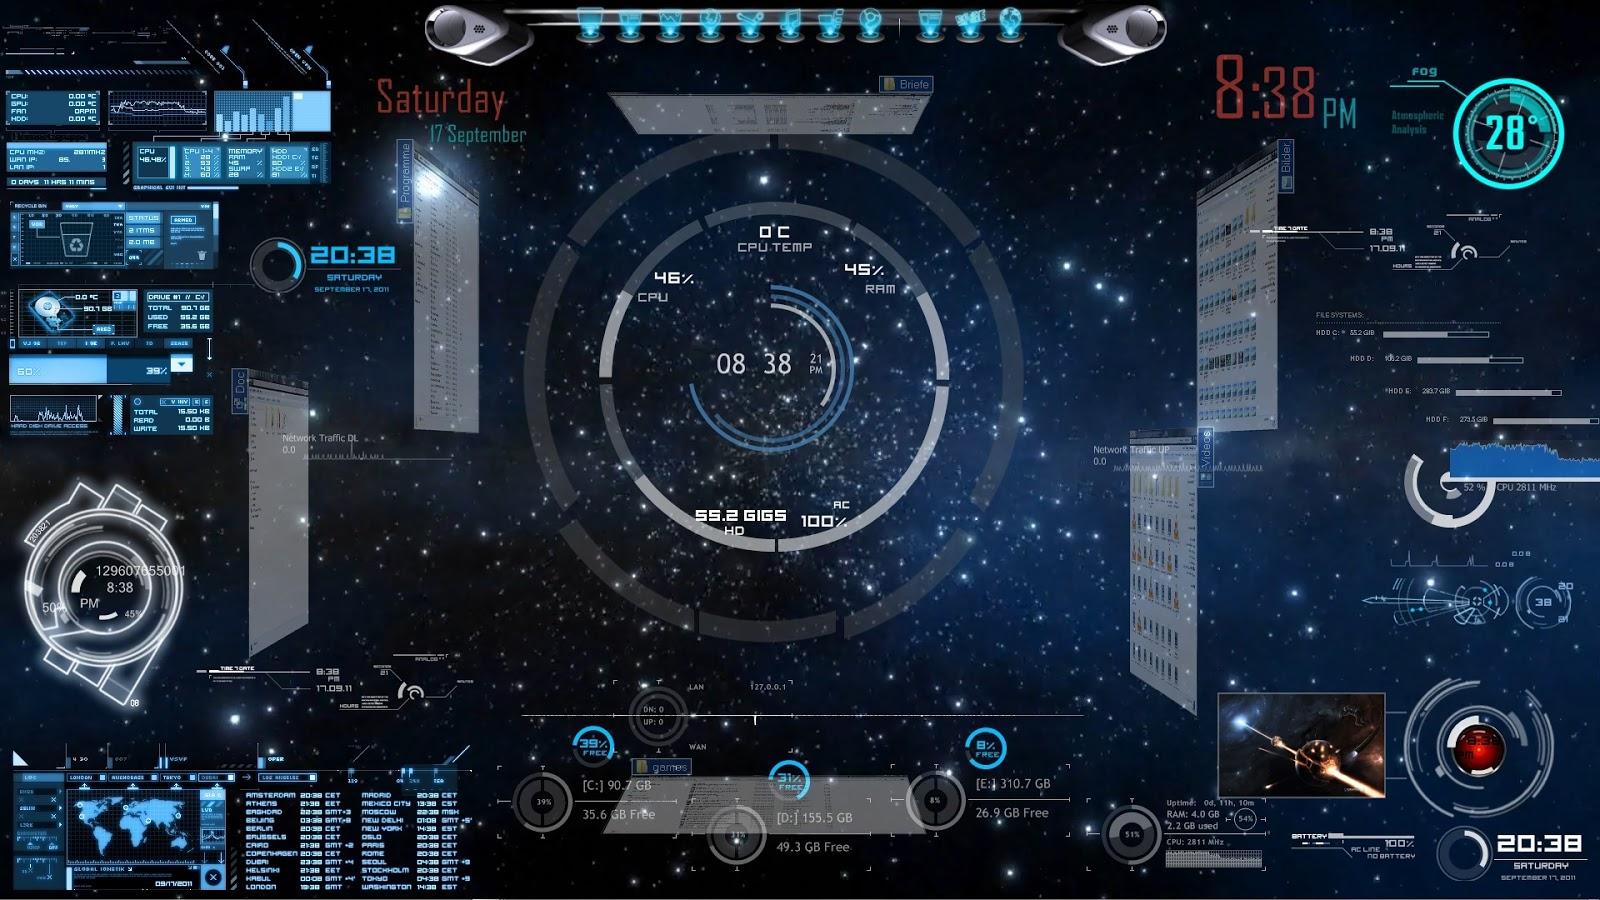 Fond d 39 cran futuriste anim fonds d 39 cran hd - Iron man 2 telecharger gratuit ...